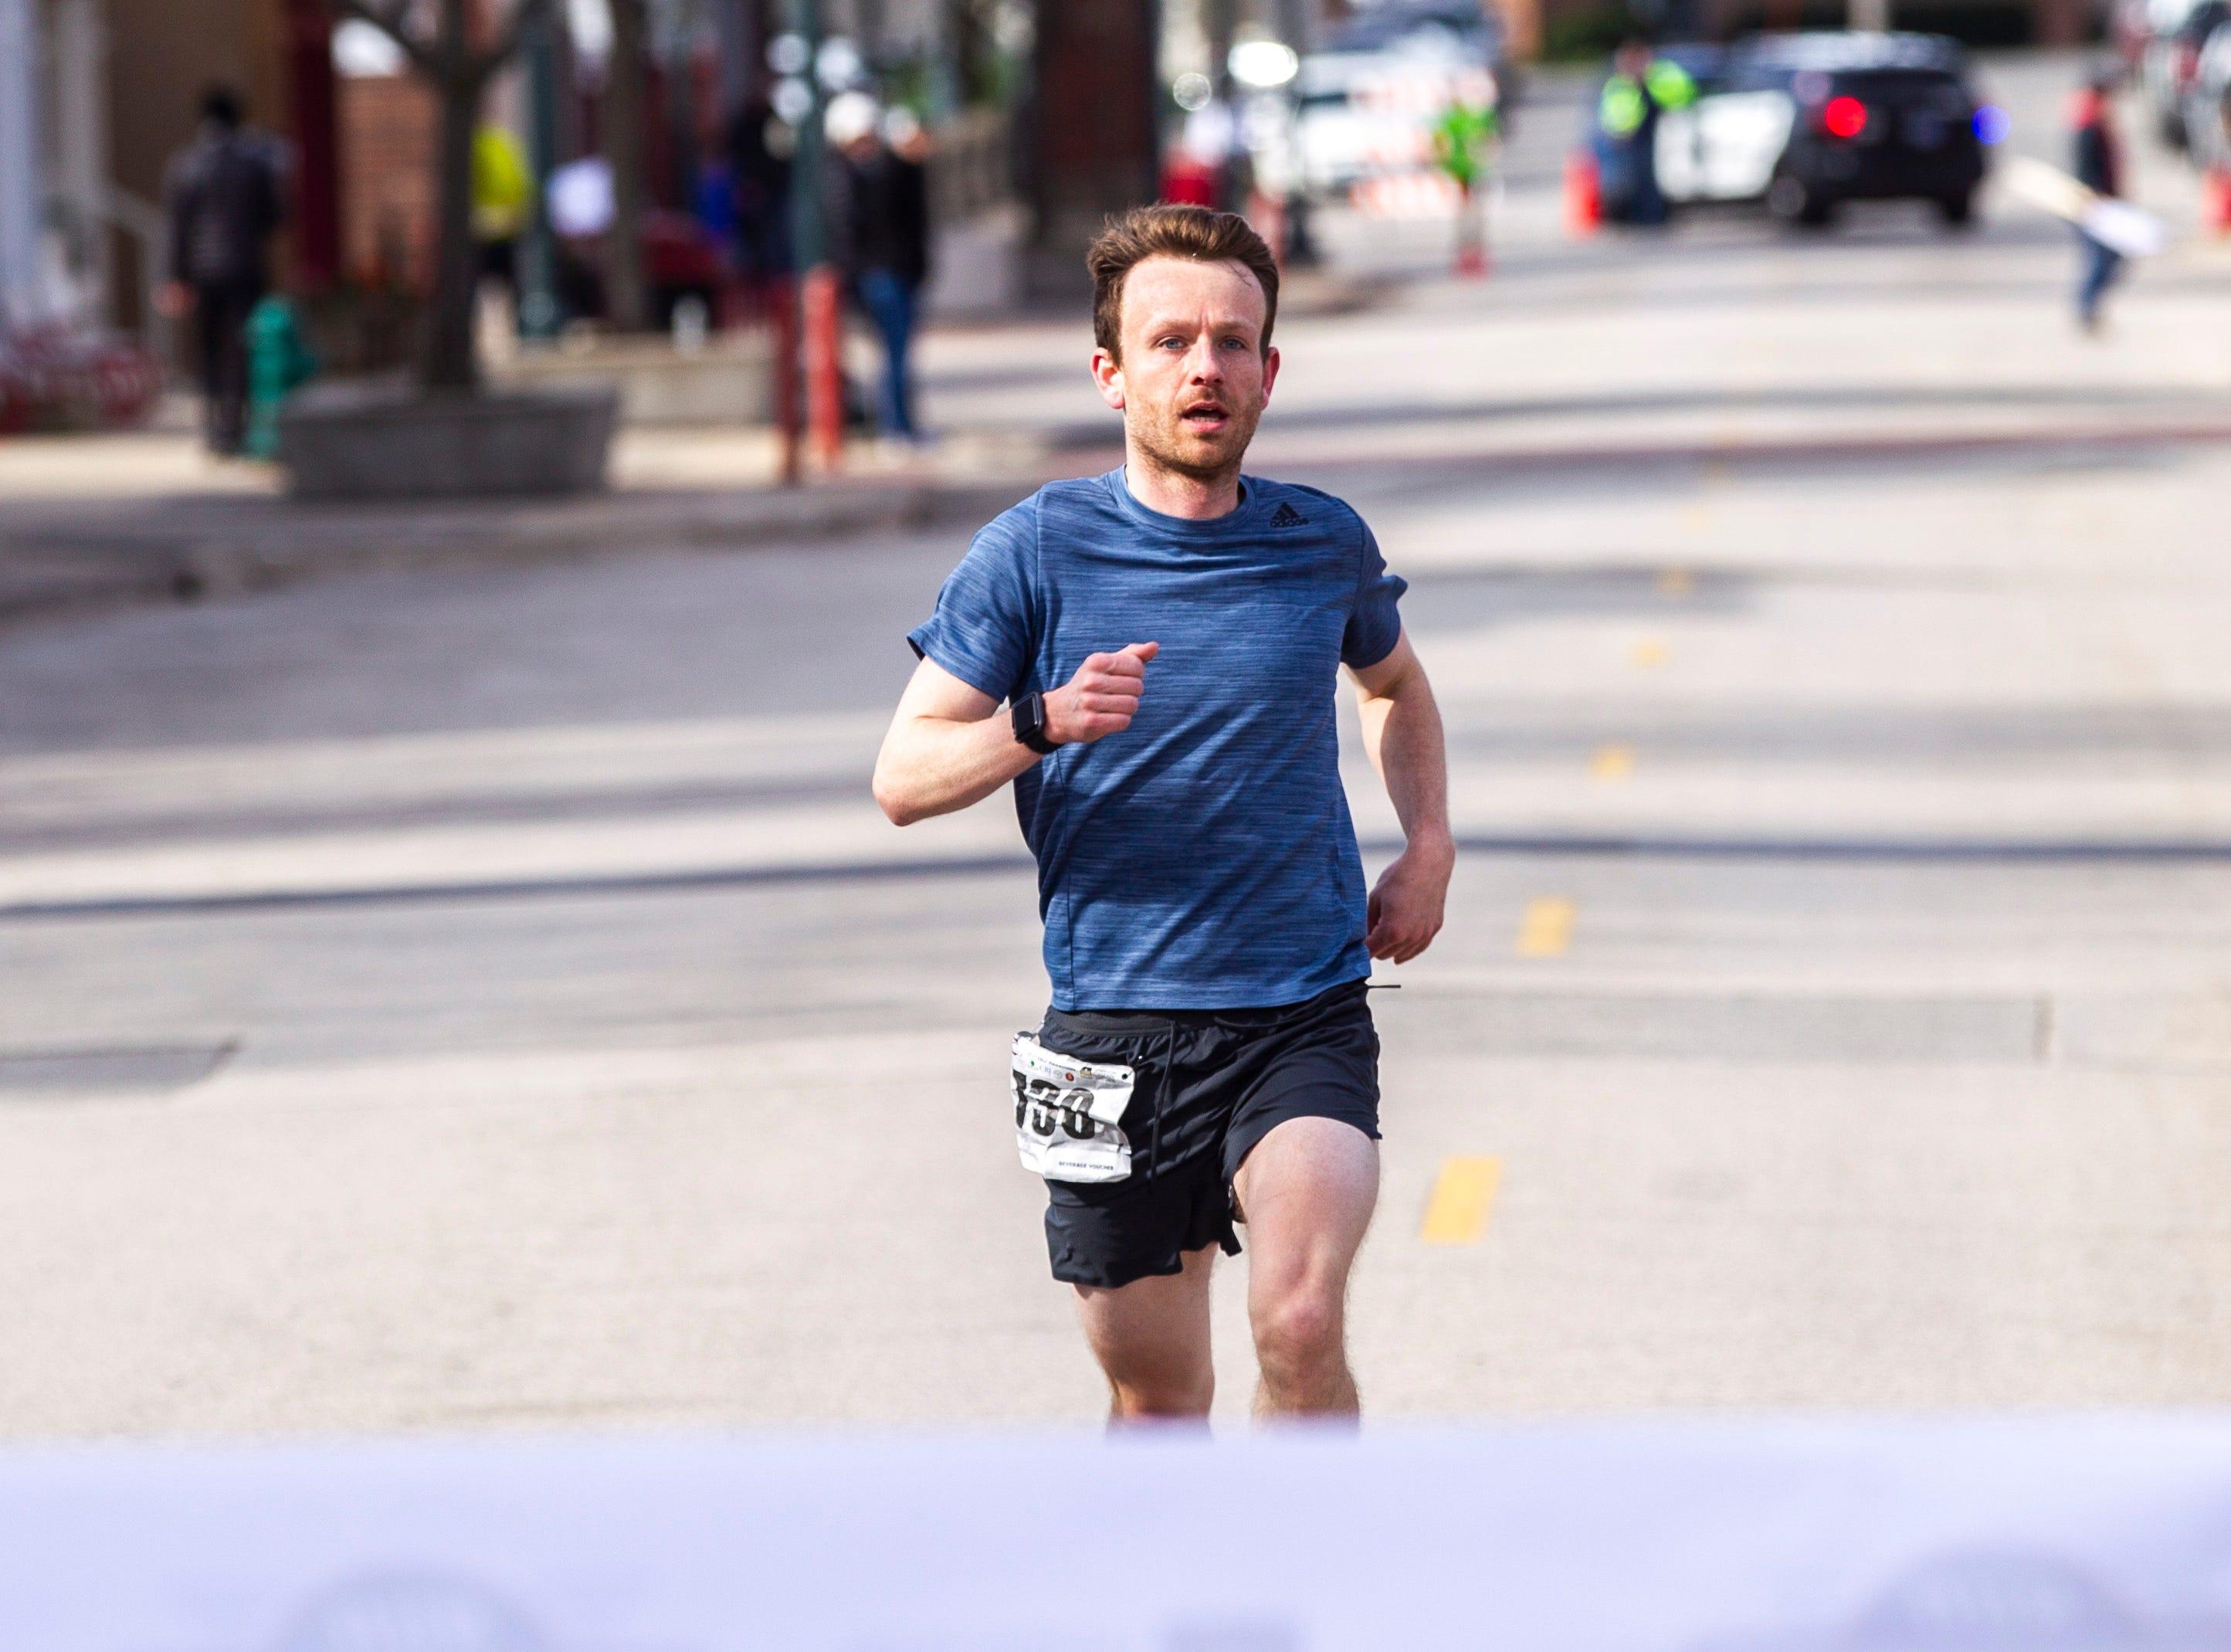 Chase Atkinson nears the finish line for the half marathon during the second annual Run CRANDIC marathon, Sunday, April 28, 2019, along 16th Avenue SE in Cedar Rapids, Iowa.